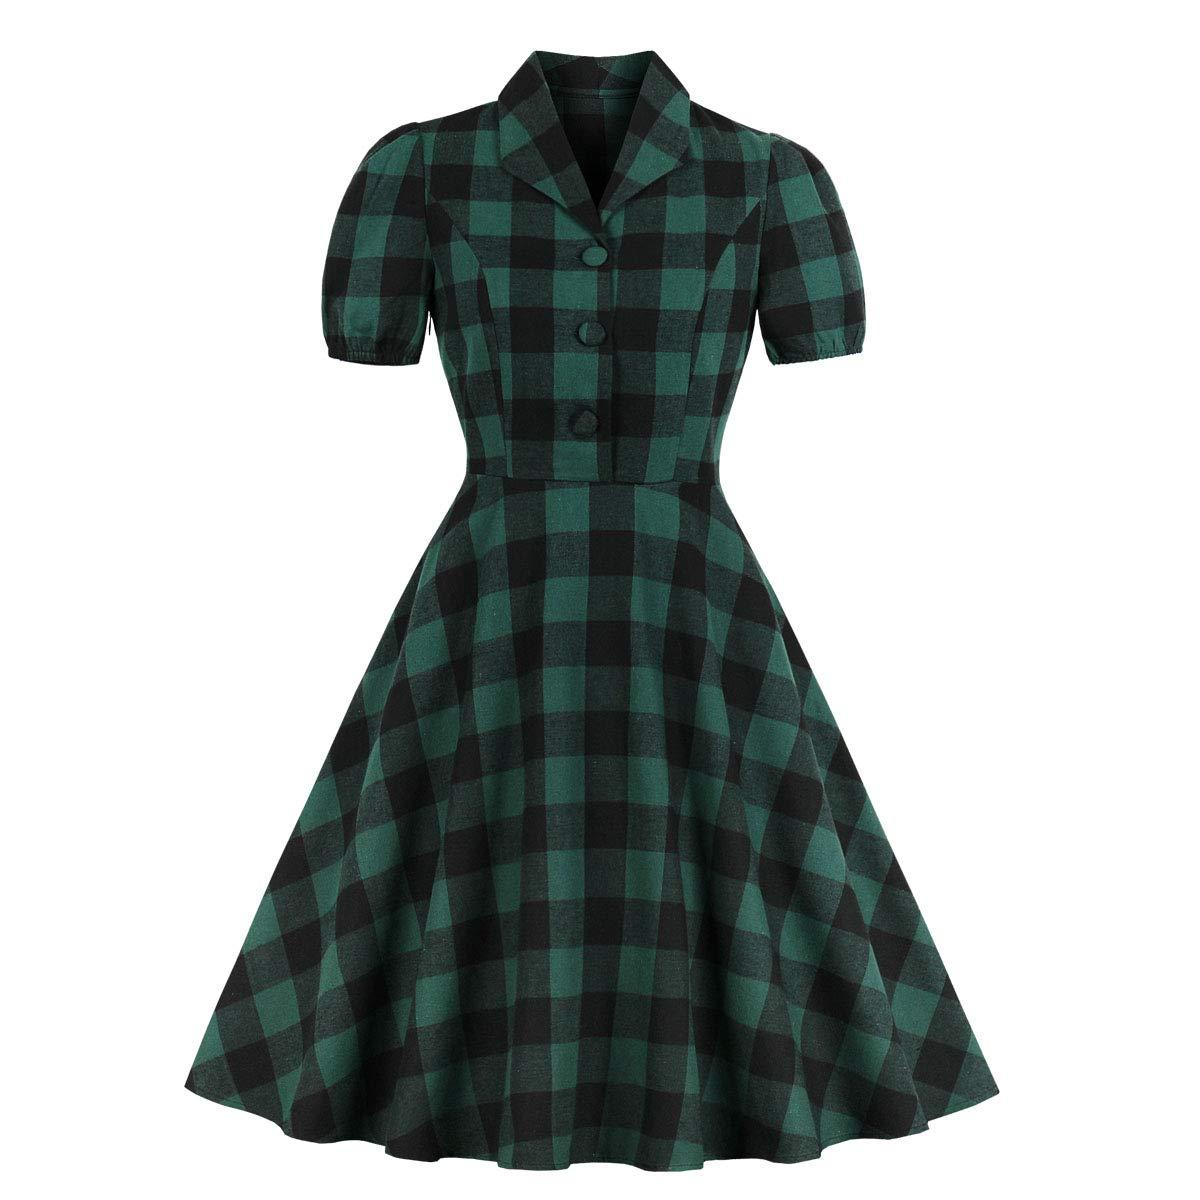 Wellwits Women's Green Check Button Down Pocket 1940s Vintage Shirt Dress